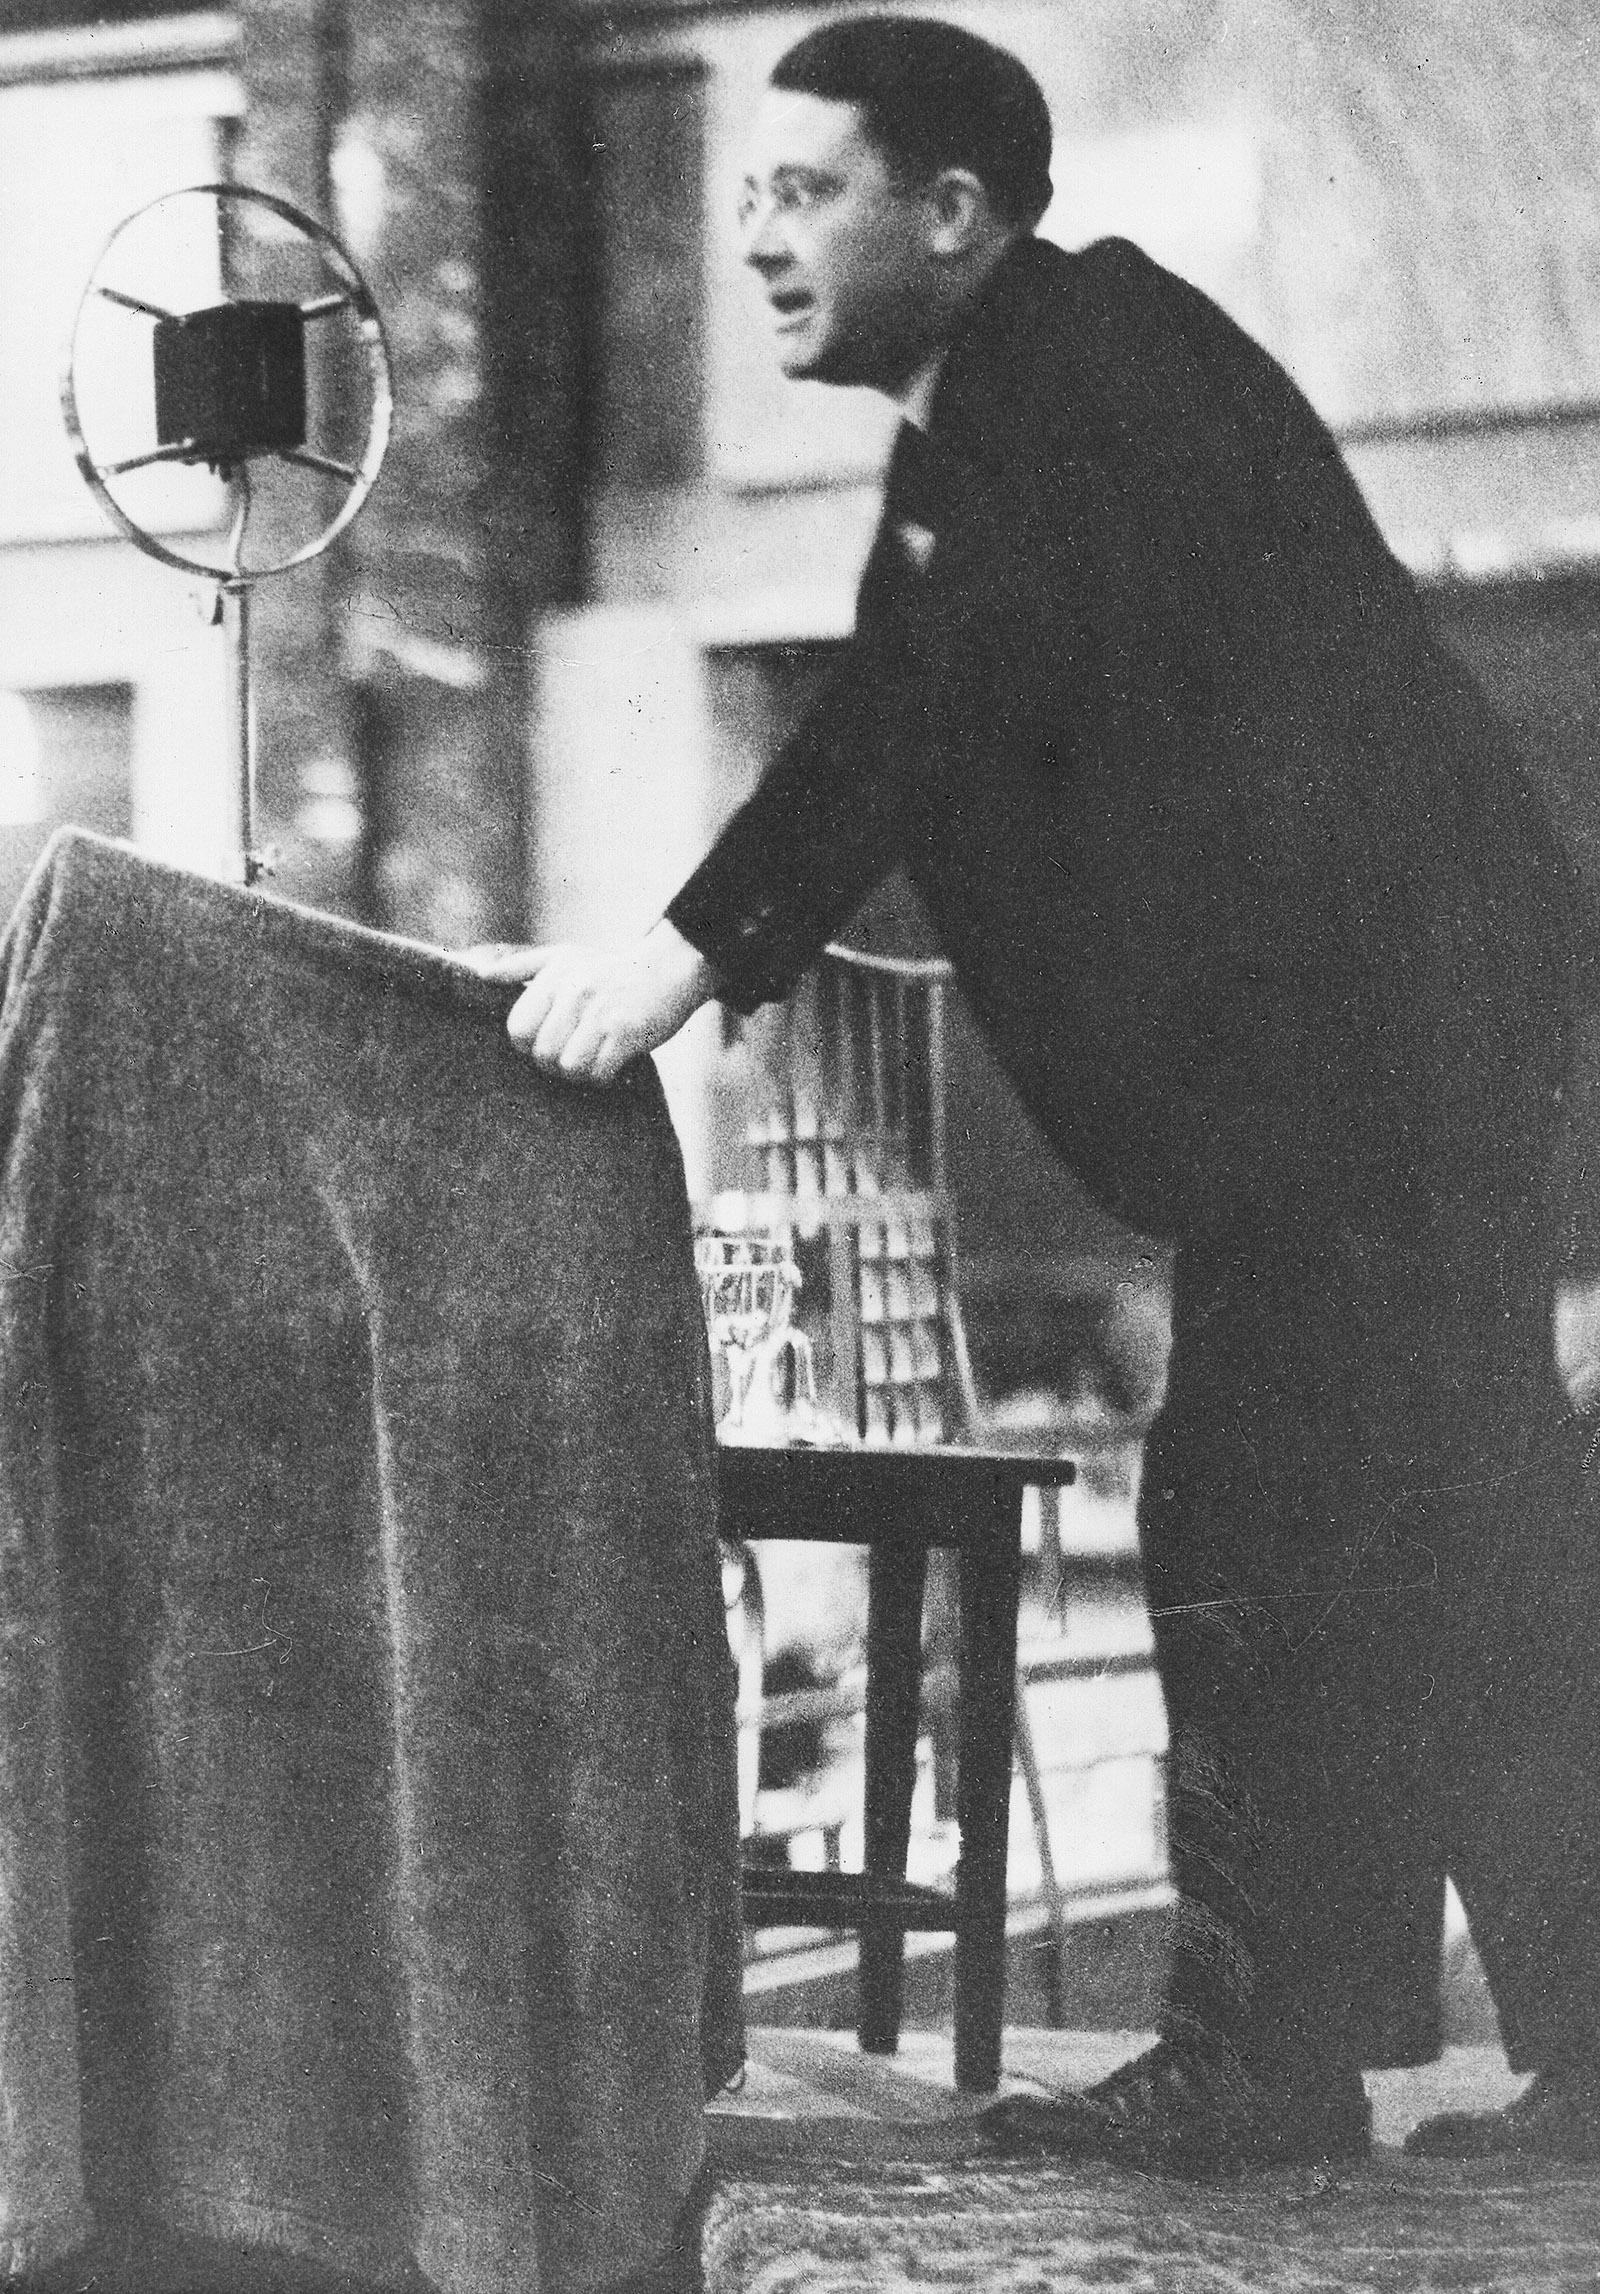 Nazi jurist Carl Schmitt speaking in Germany, 1930